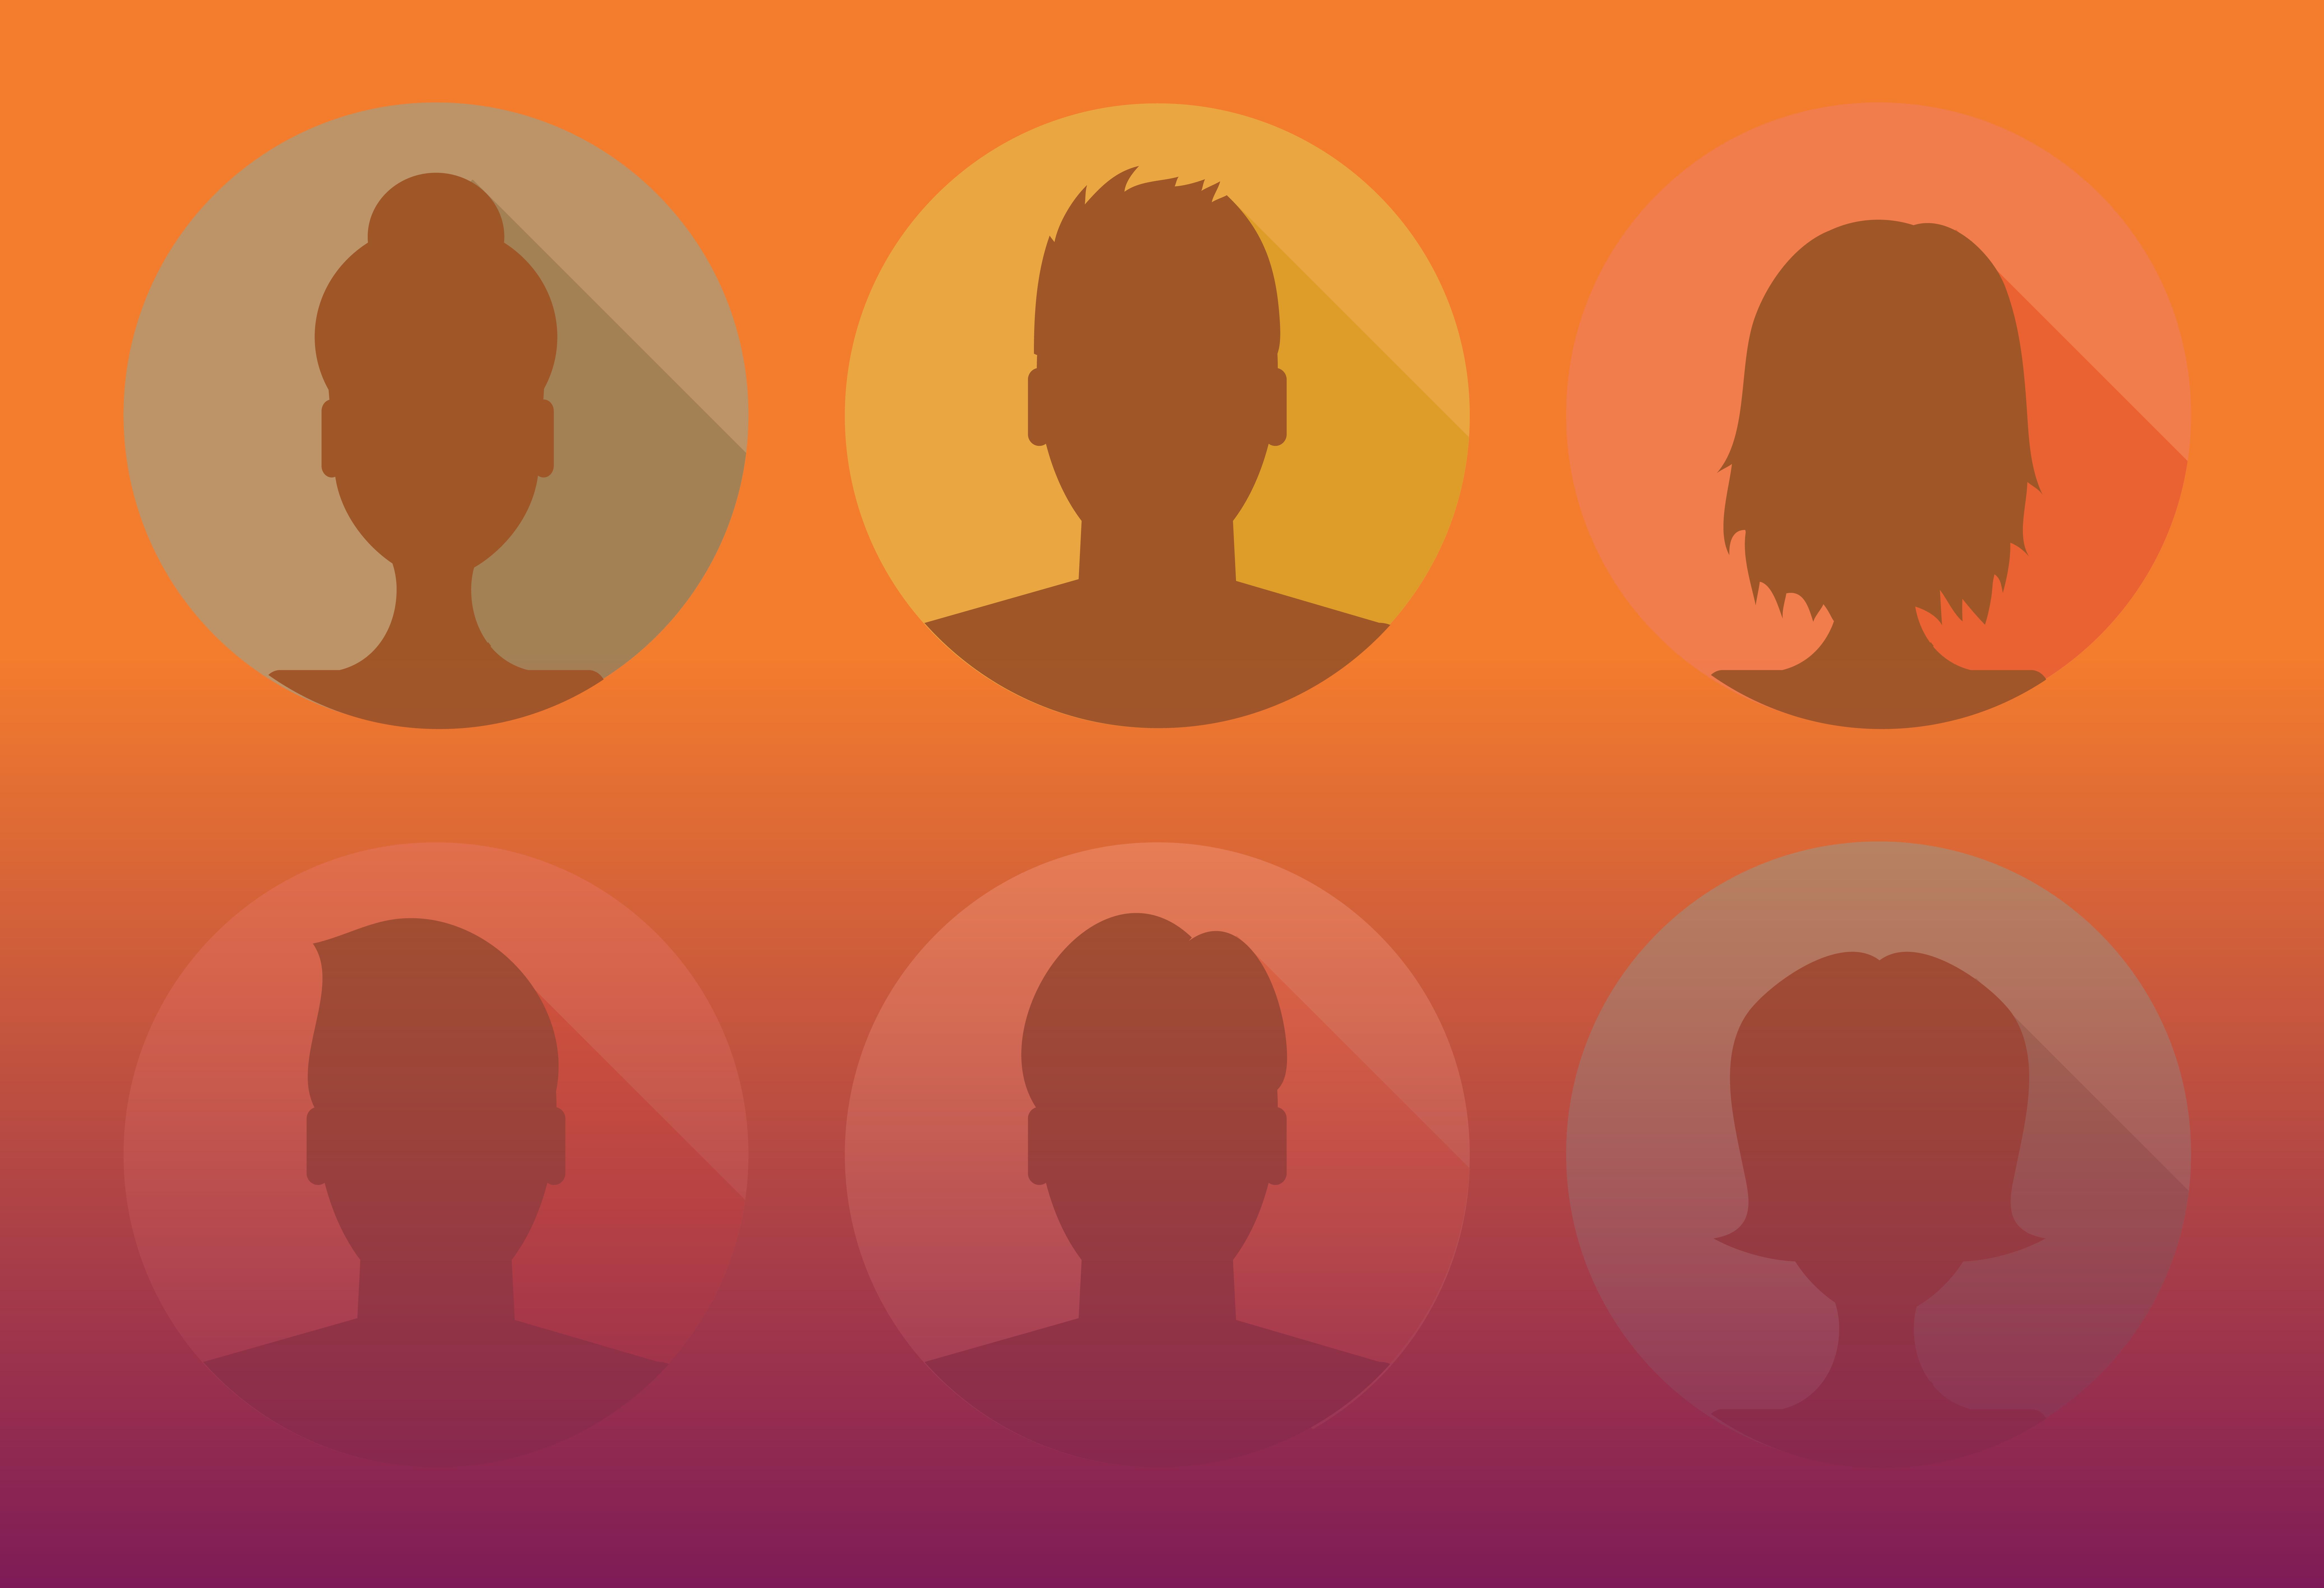 Instagram profile photo size (plus tips & tricks) - ShareThis